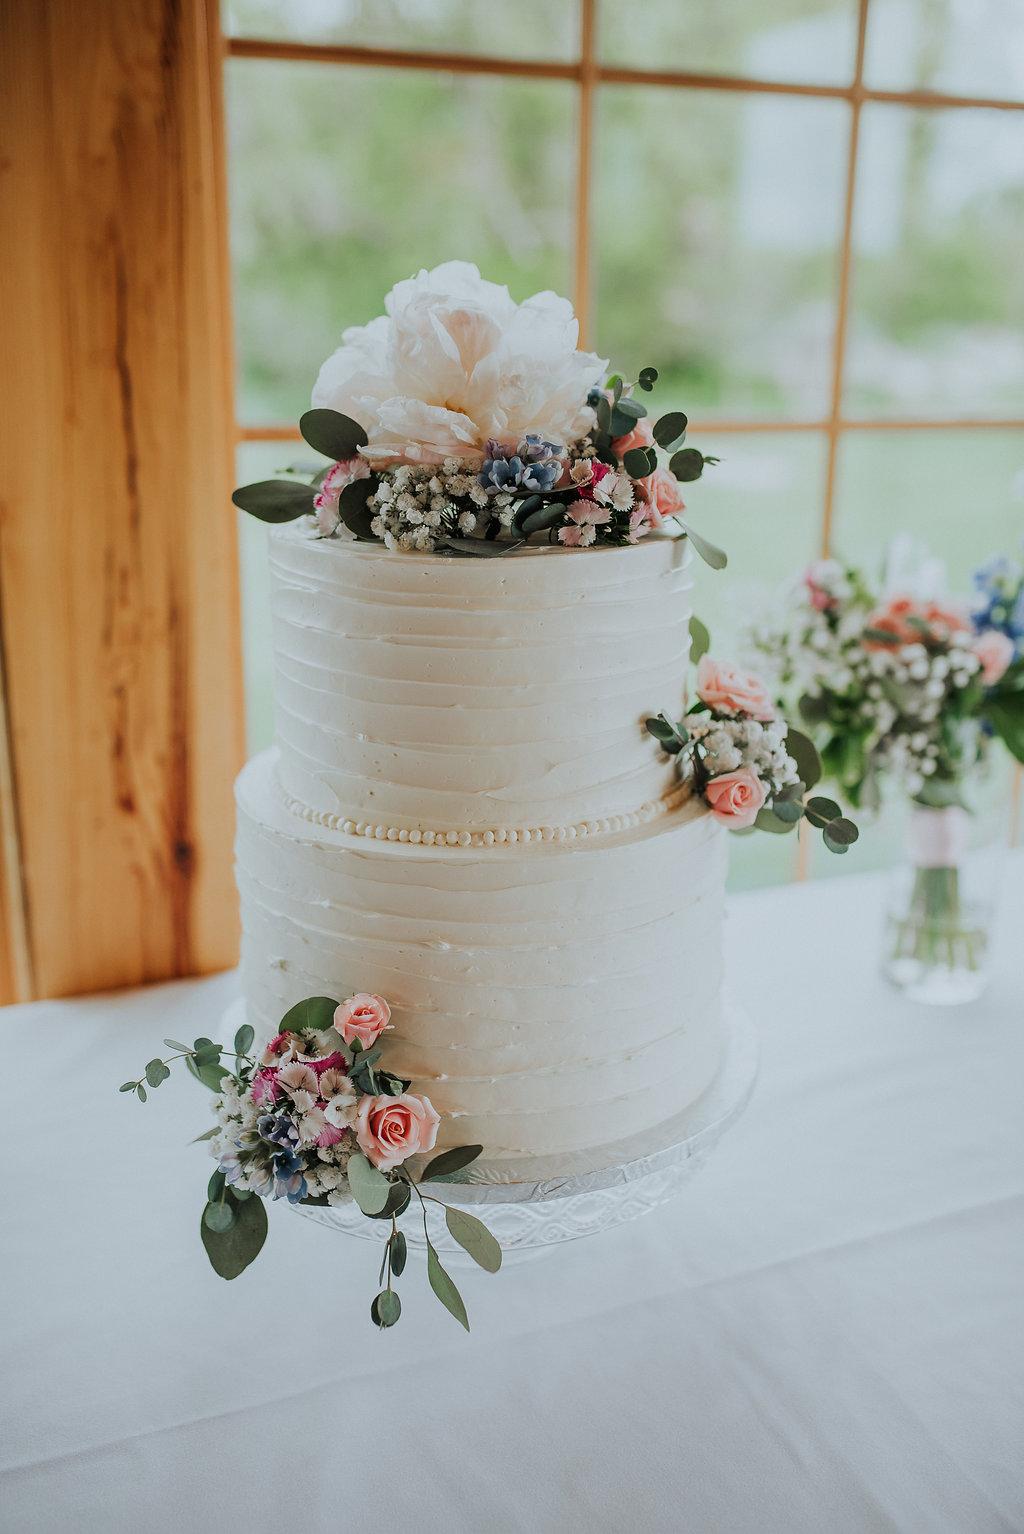 Buttercream Cake with Flowers - Wedding Florist Winnipeg